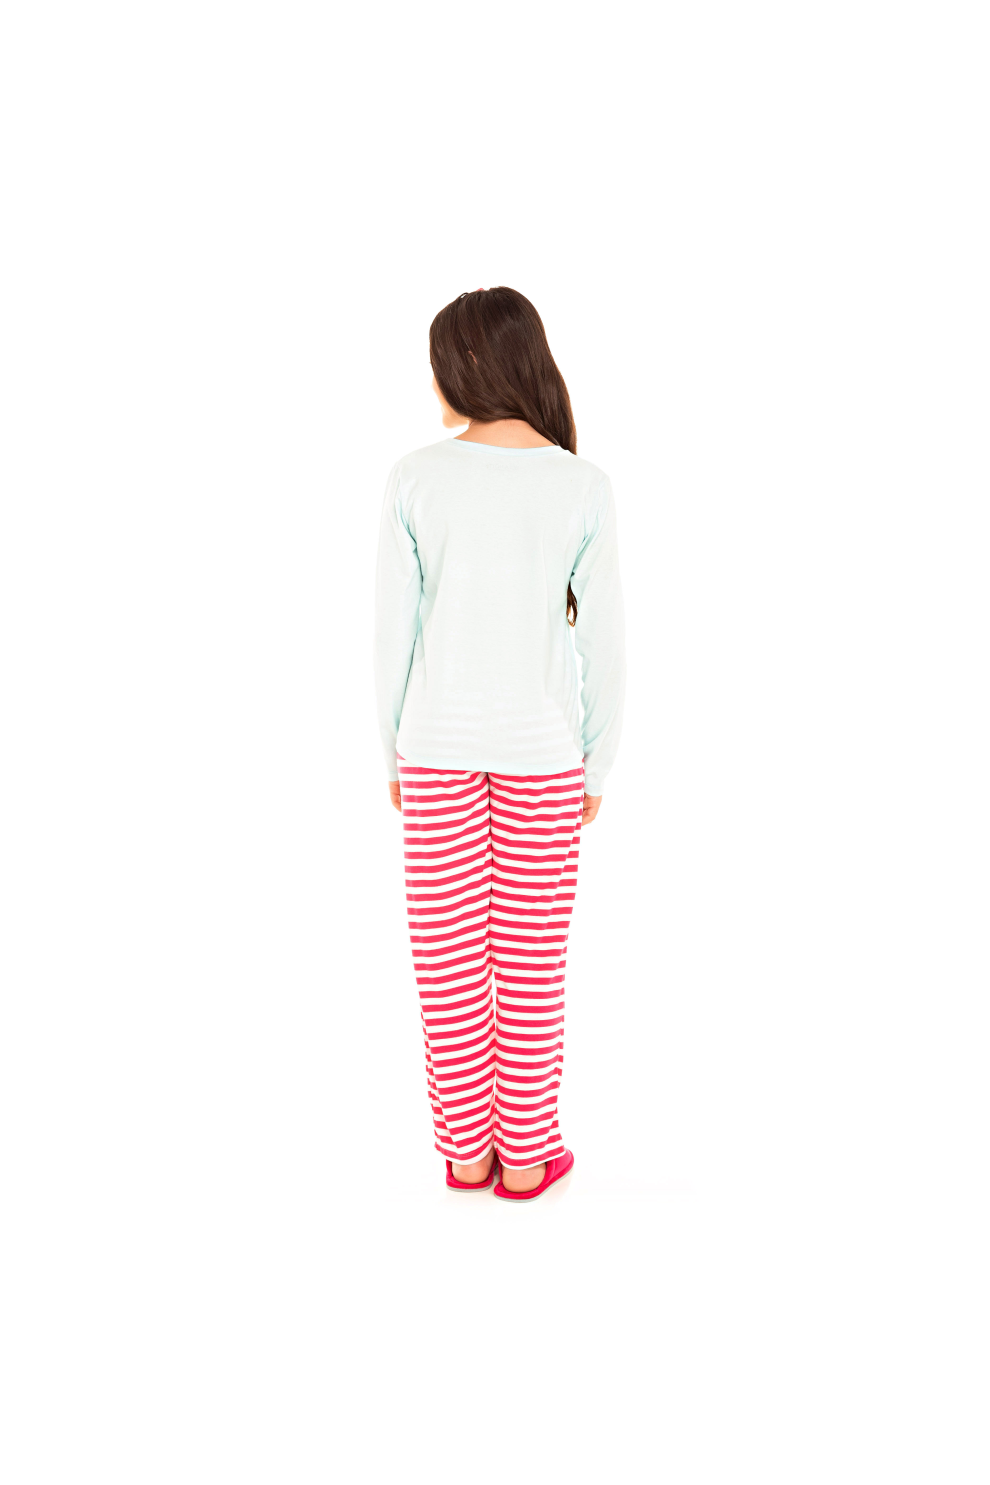 232/E - Pijama Juvenil Feminino Togheher  We  Are Better